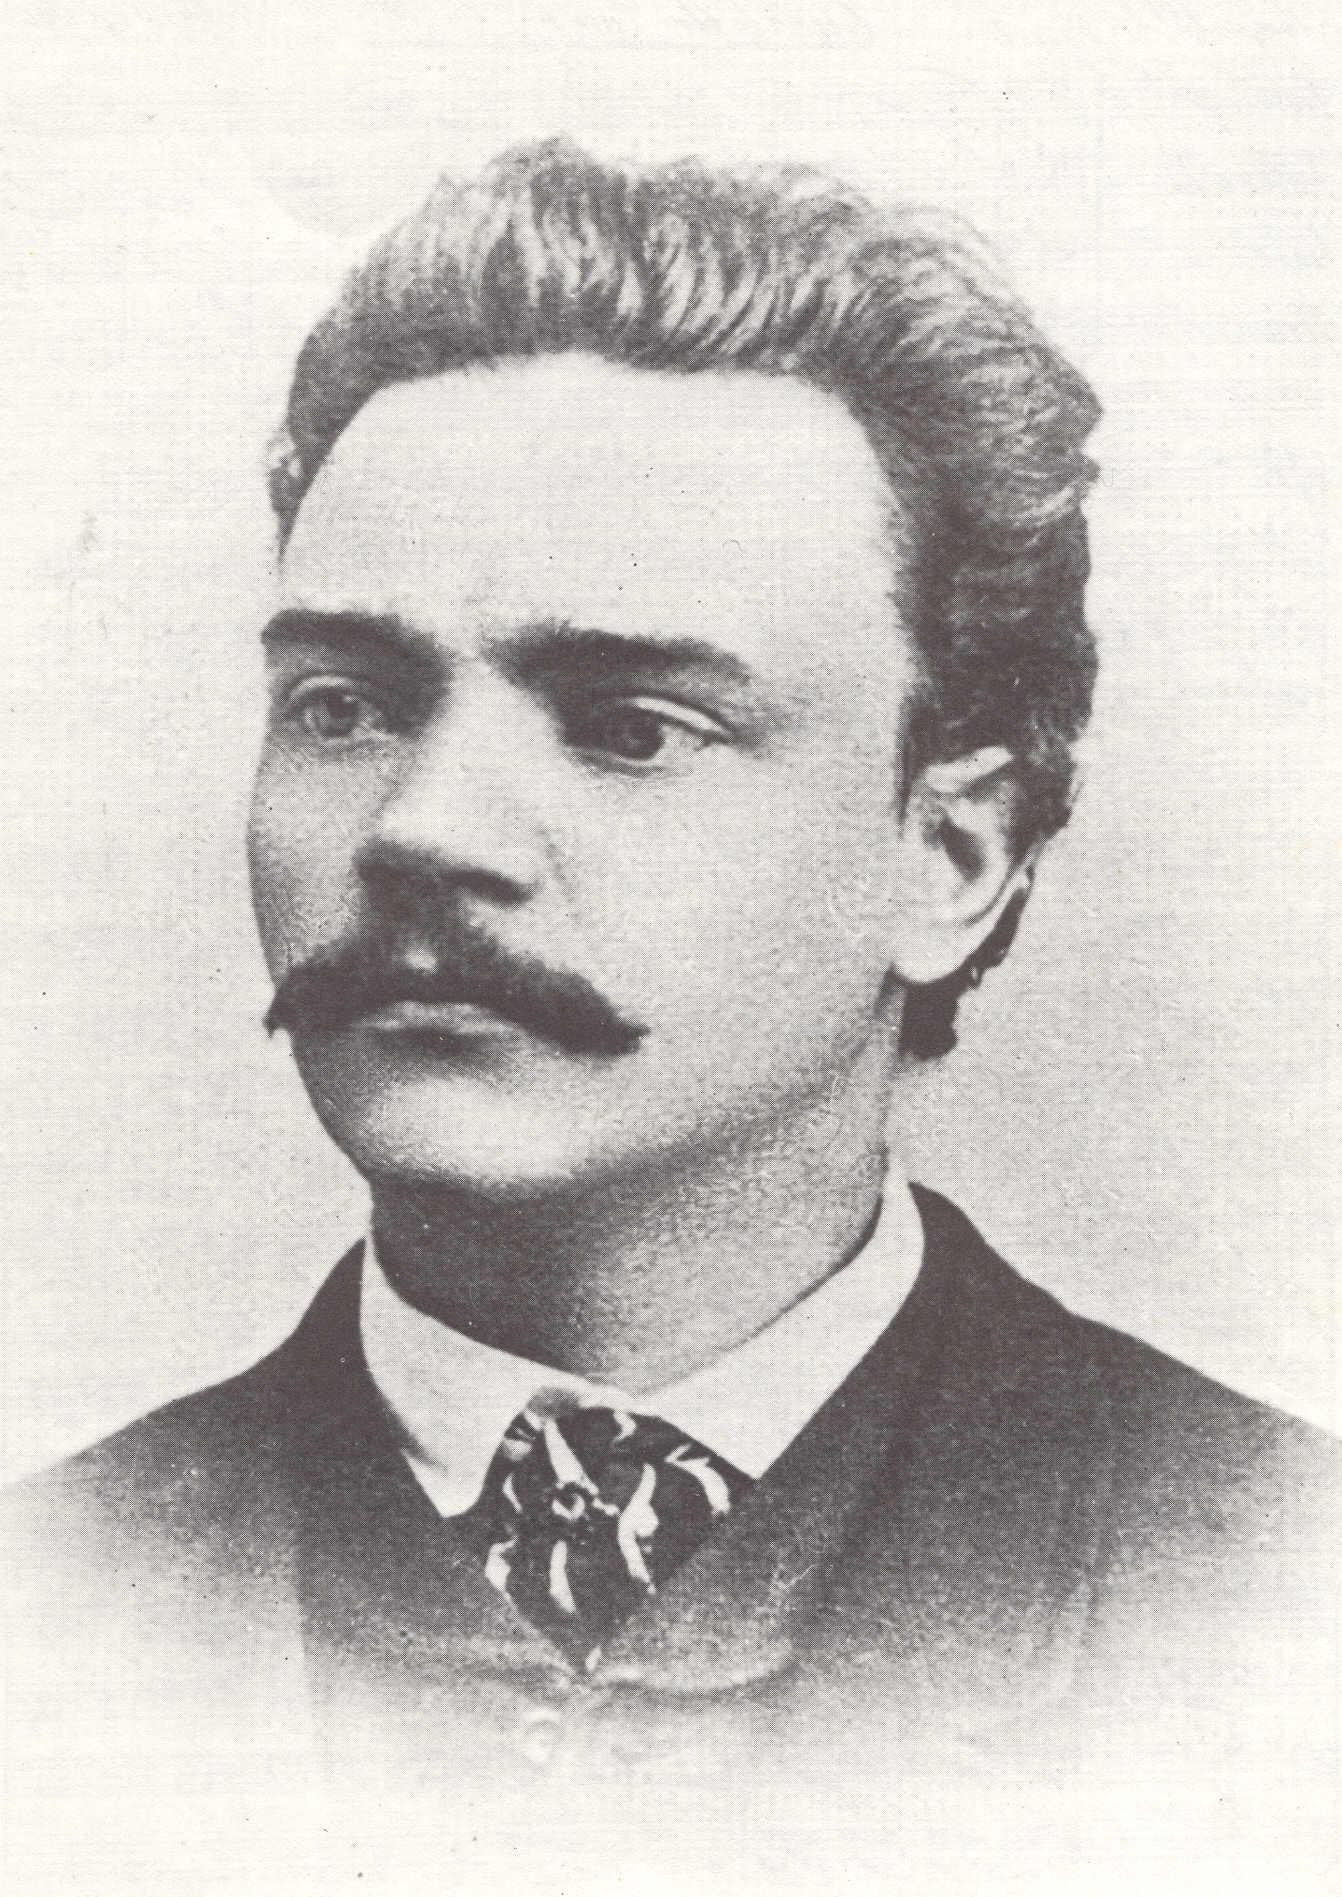 http://upload.wikimedia.org/wikipedia/commons/0/04/Dvorak_1868.jpg